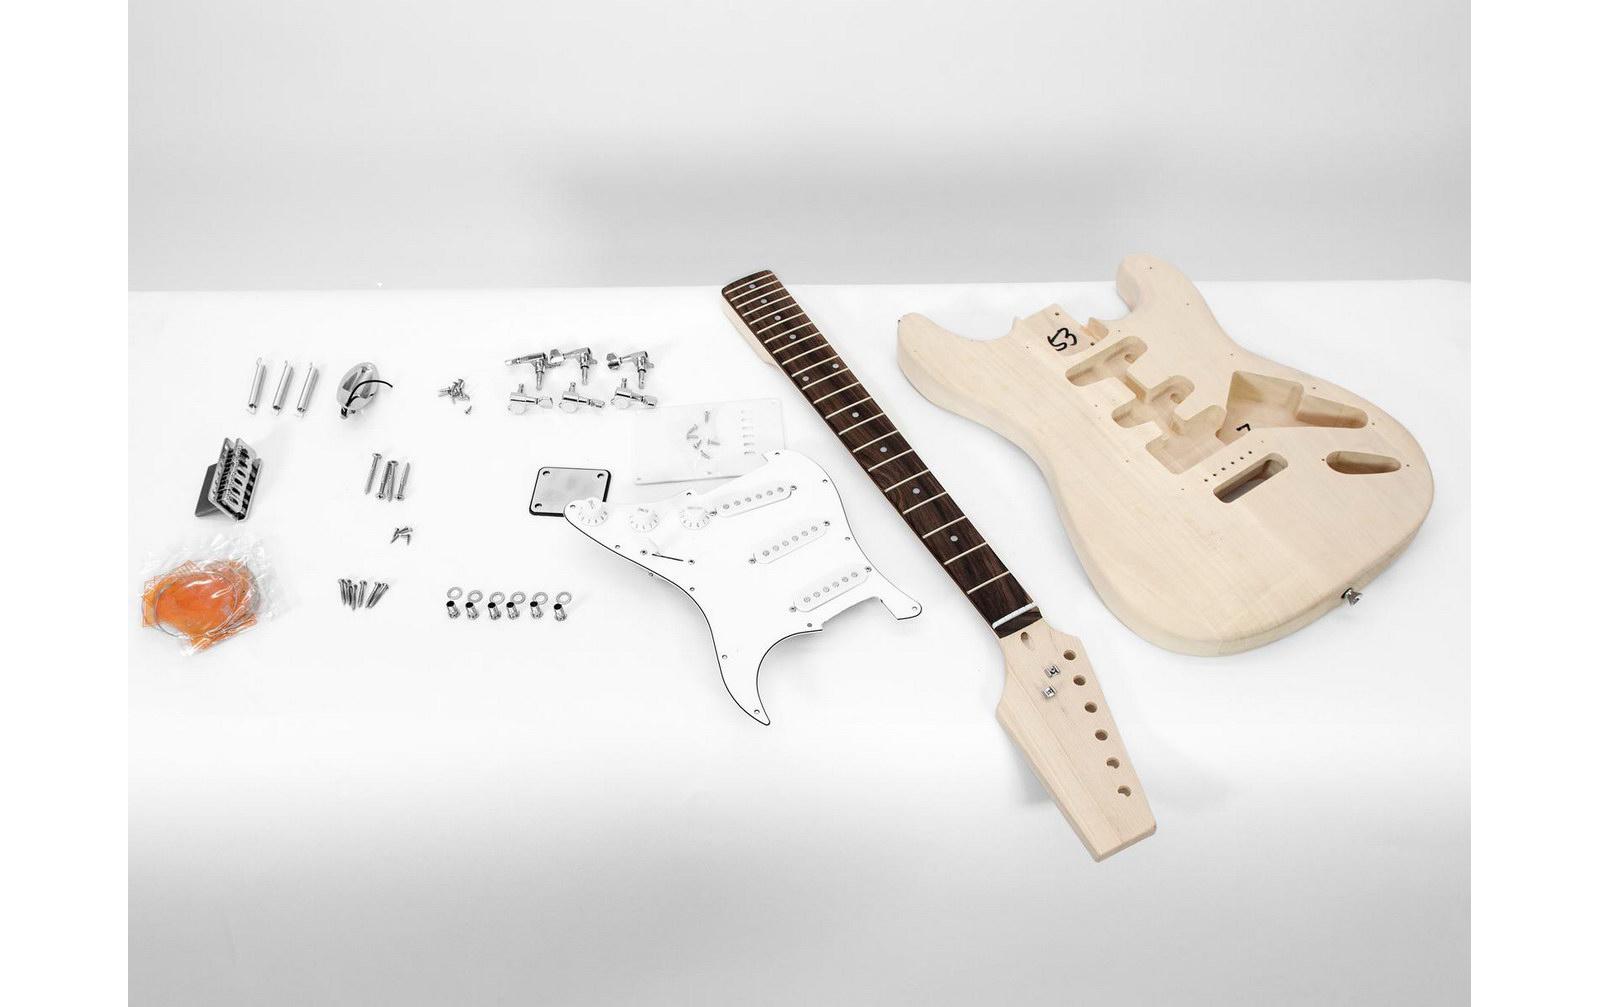 dimavery-diy-st-20-gitarrenbausatz